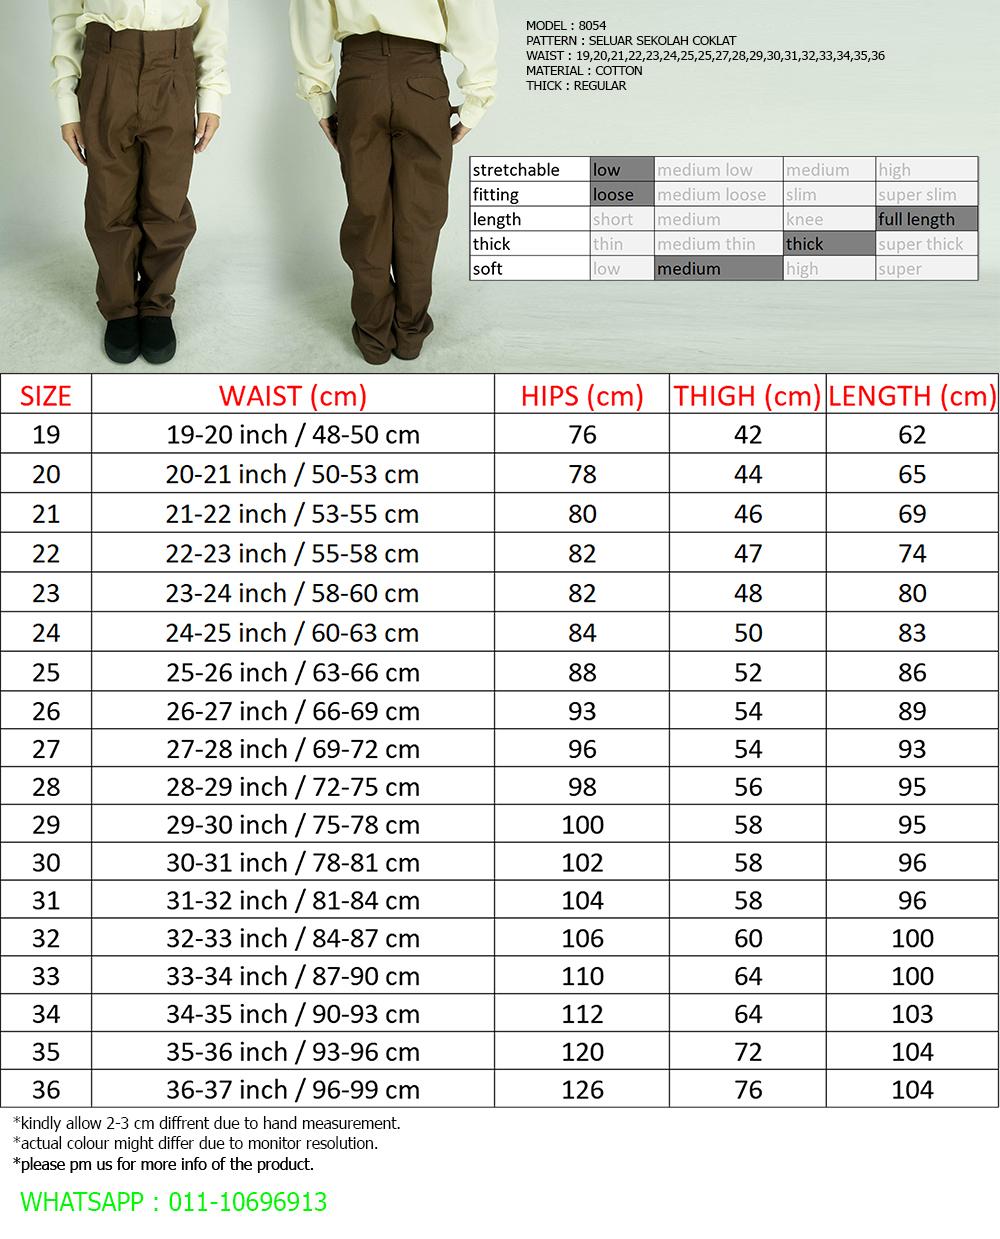 CY 8054 SELUAR PANJANG HIJAU SEKOLAH UNIFORM  /SCHOOL LONG PANTS BROWN / COKLAT